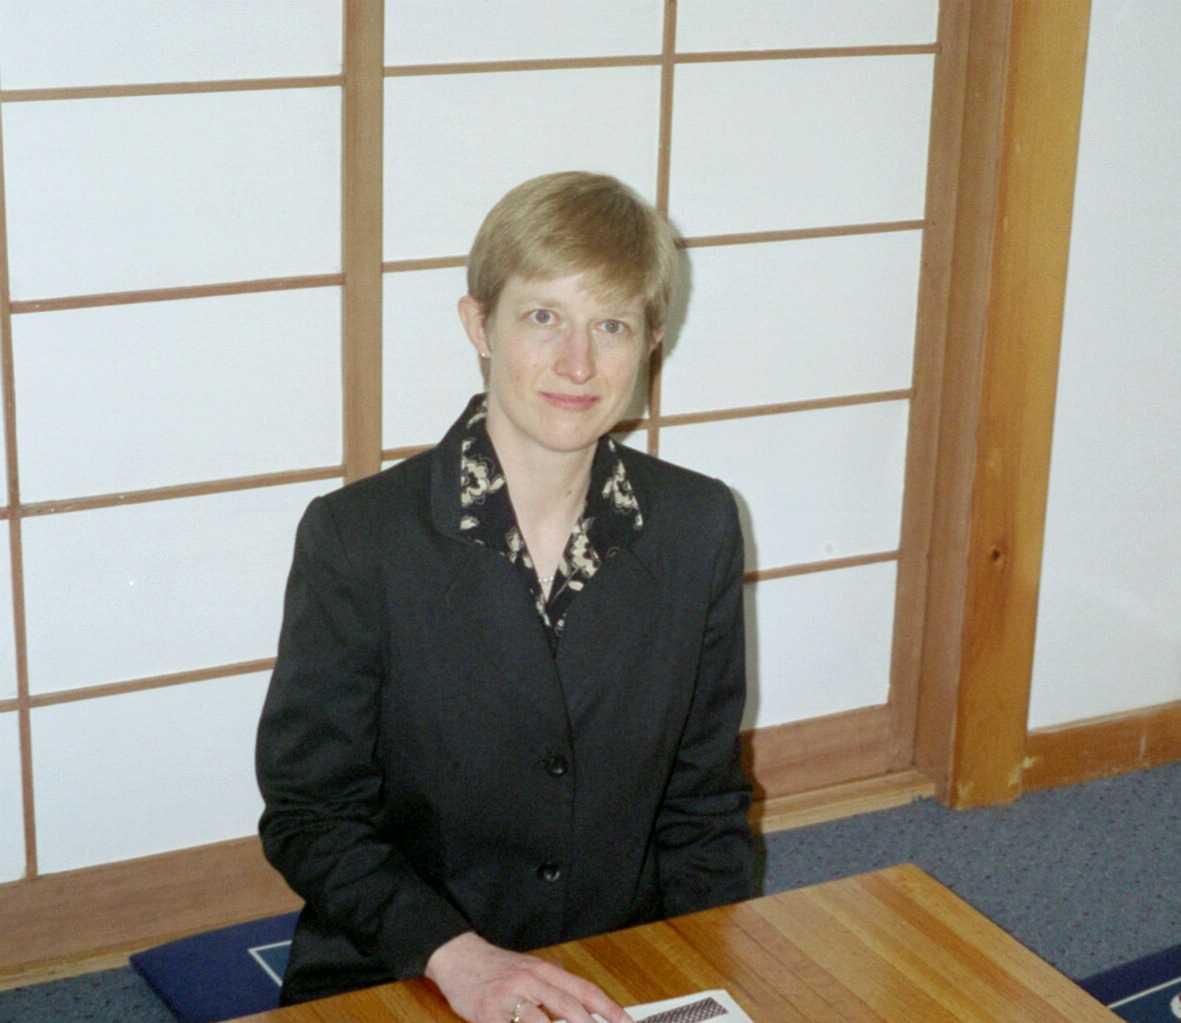 Sushi 10-2005.jpg